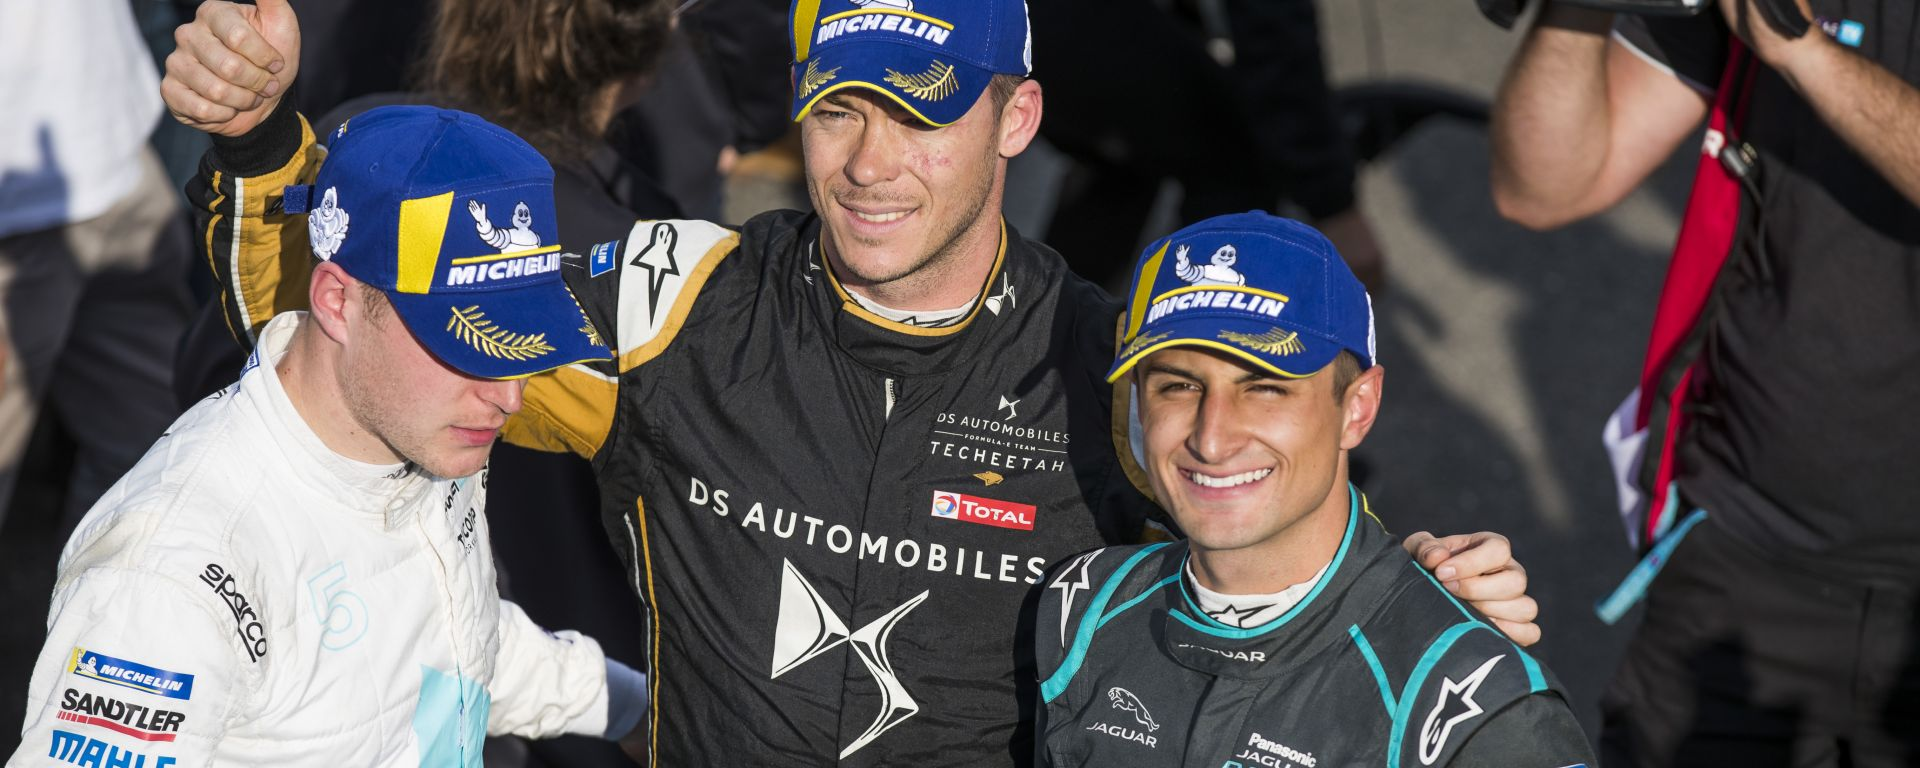 ePrix Roma 2019, il podio composto da Vandoorne, Lotterer ed Evans